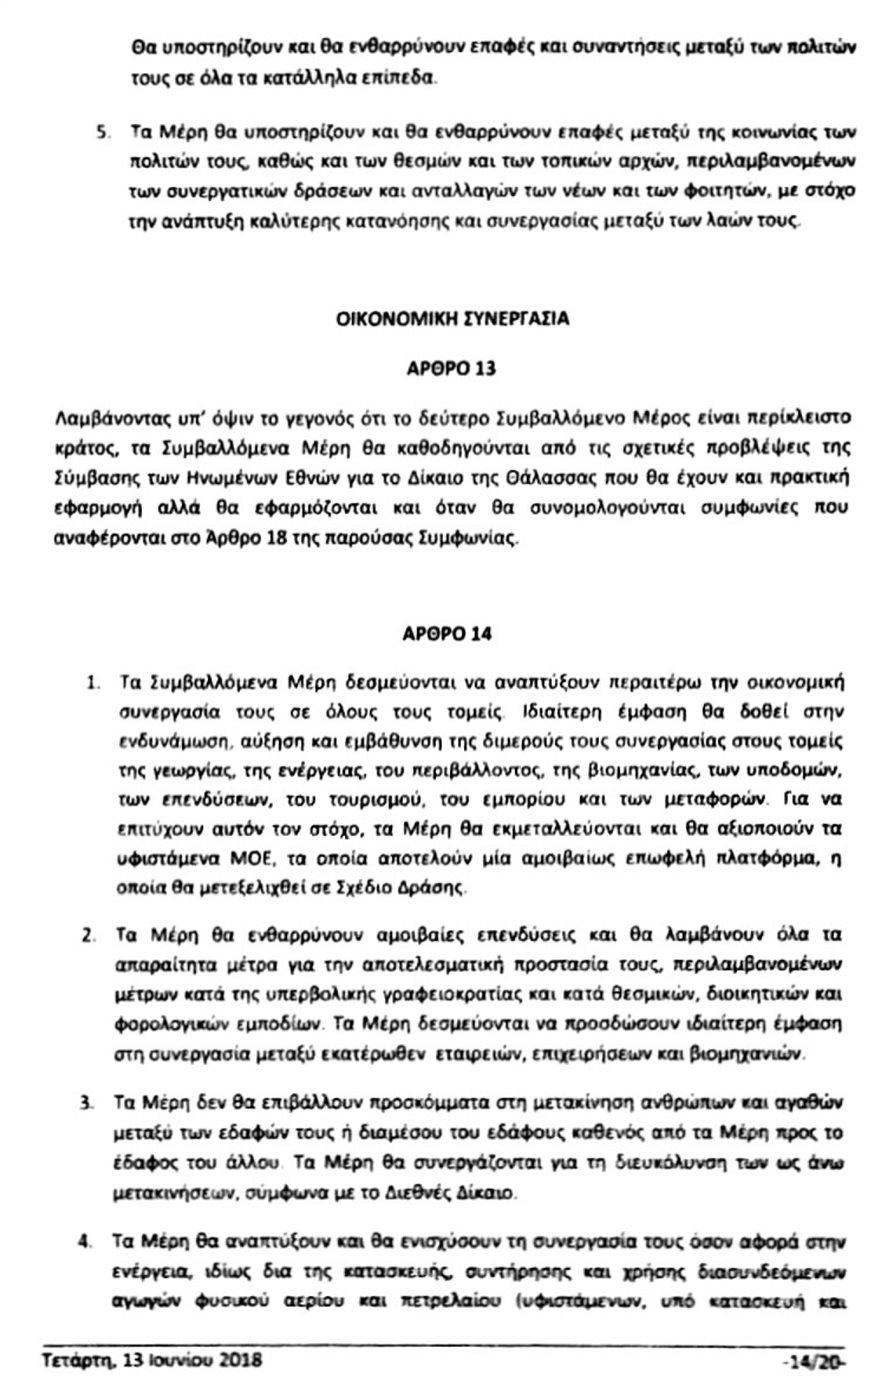 makedoniko14